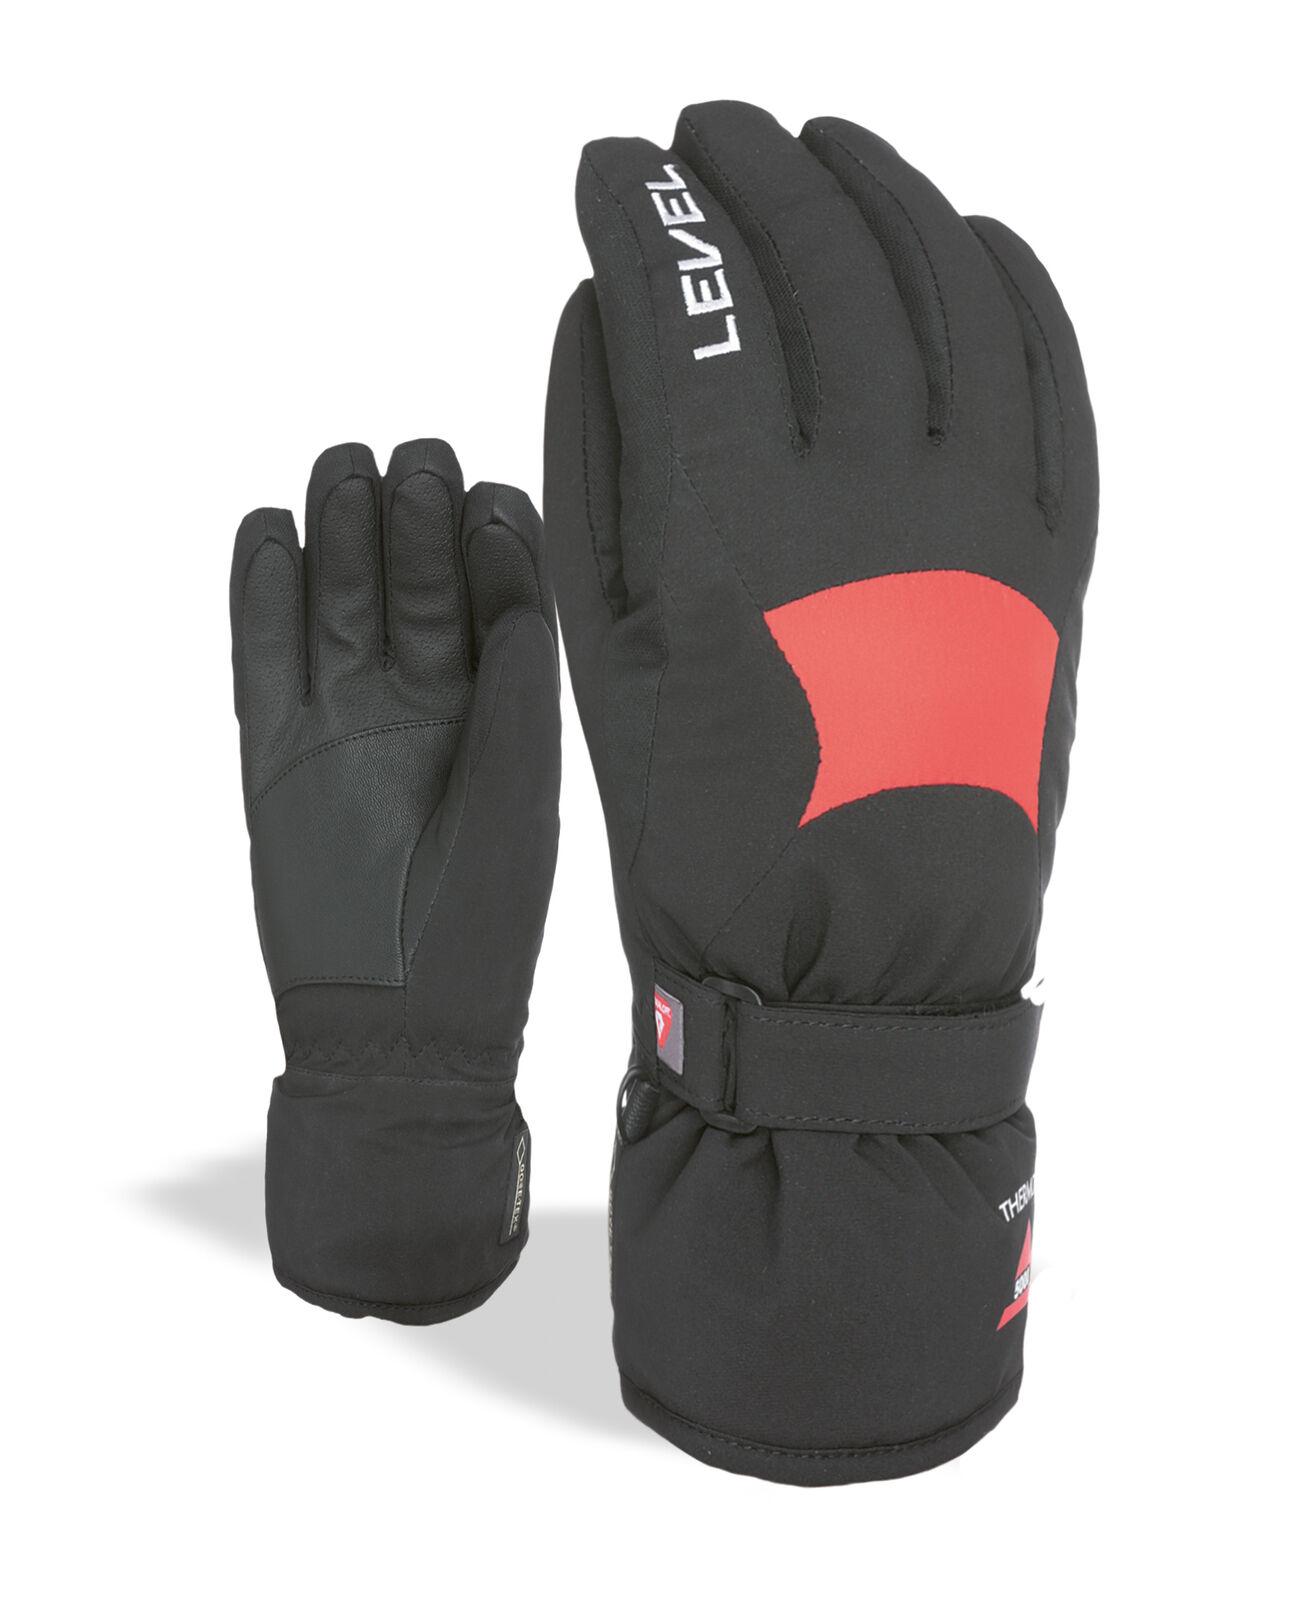 Level Handschuh  Super Radiator JR Gore-Tex black winddicht wärmend